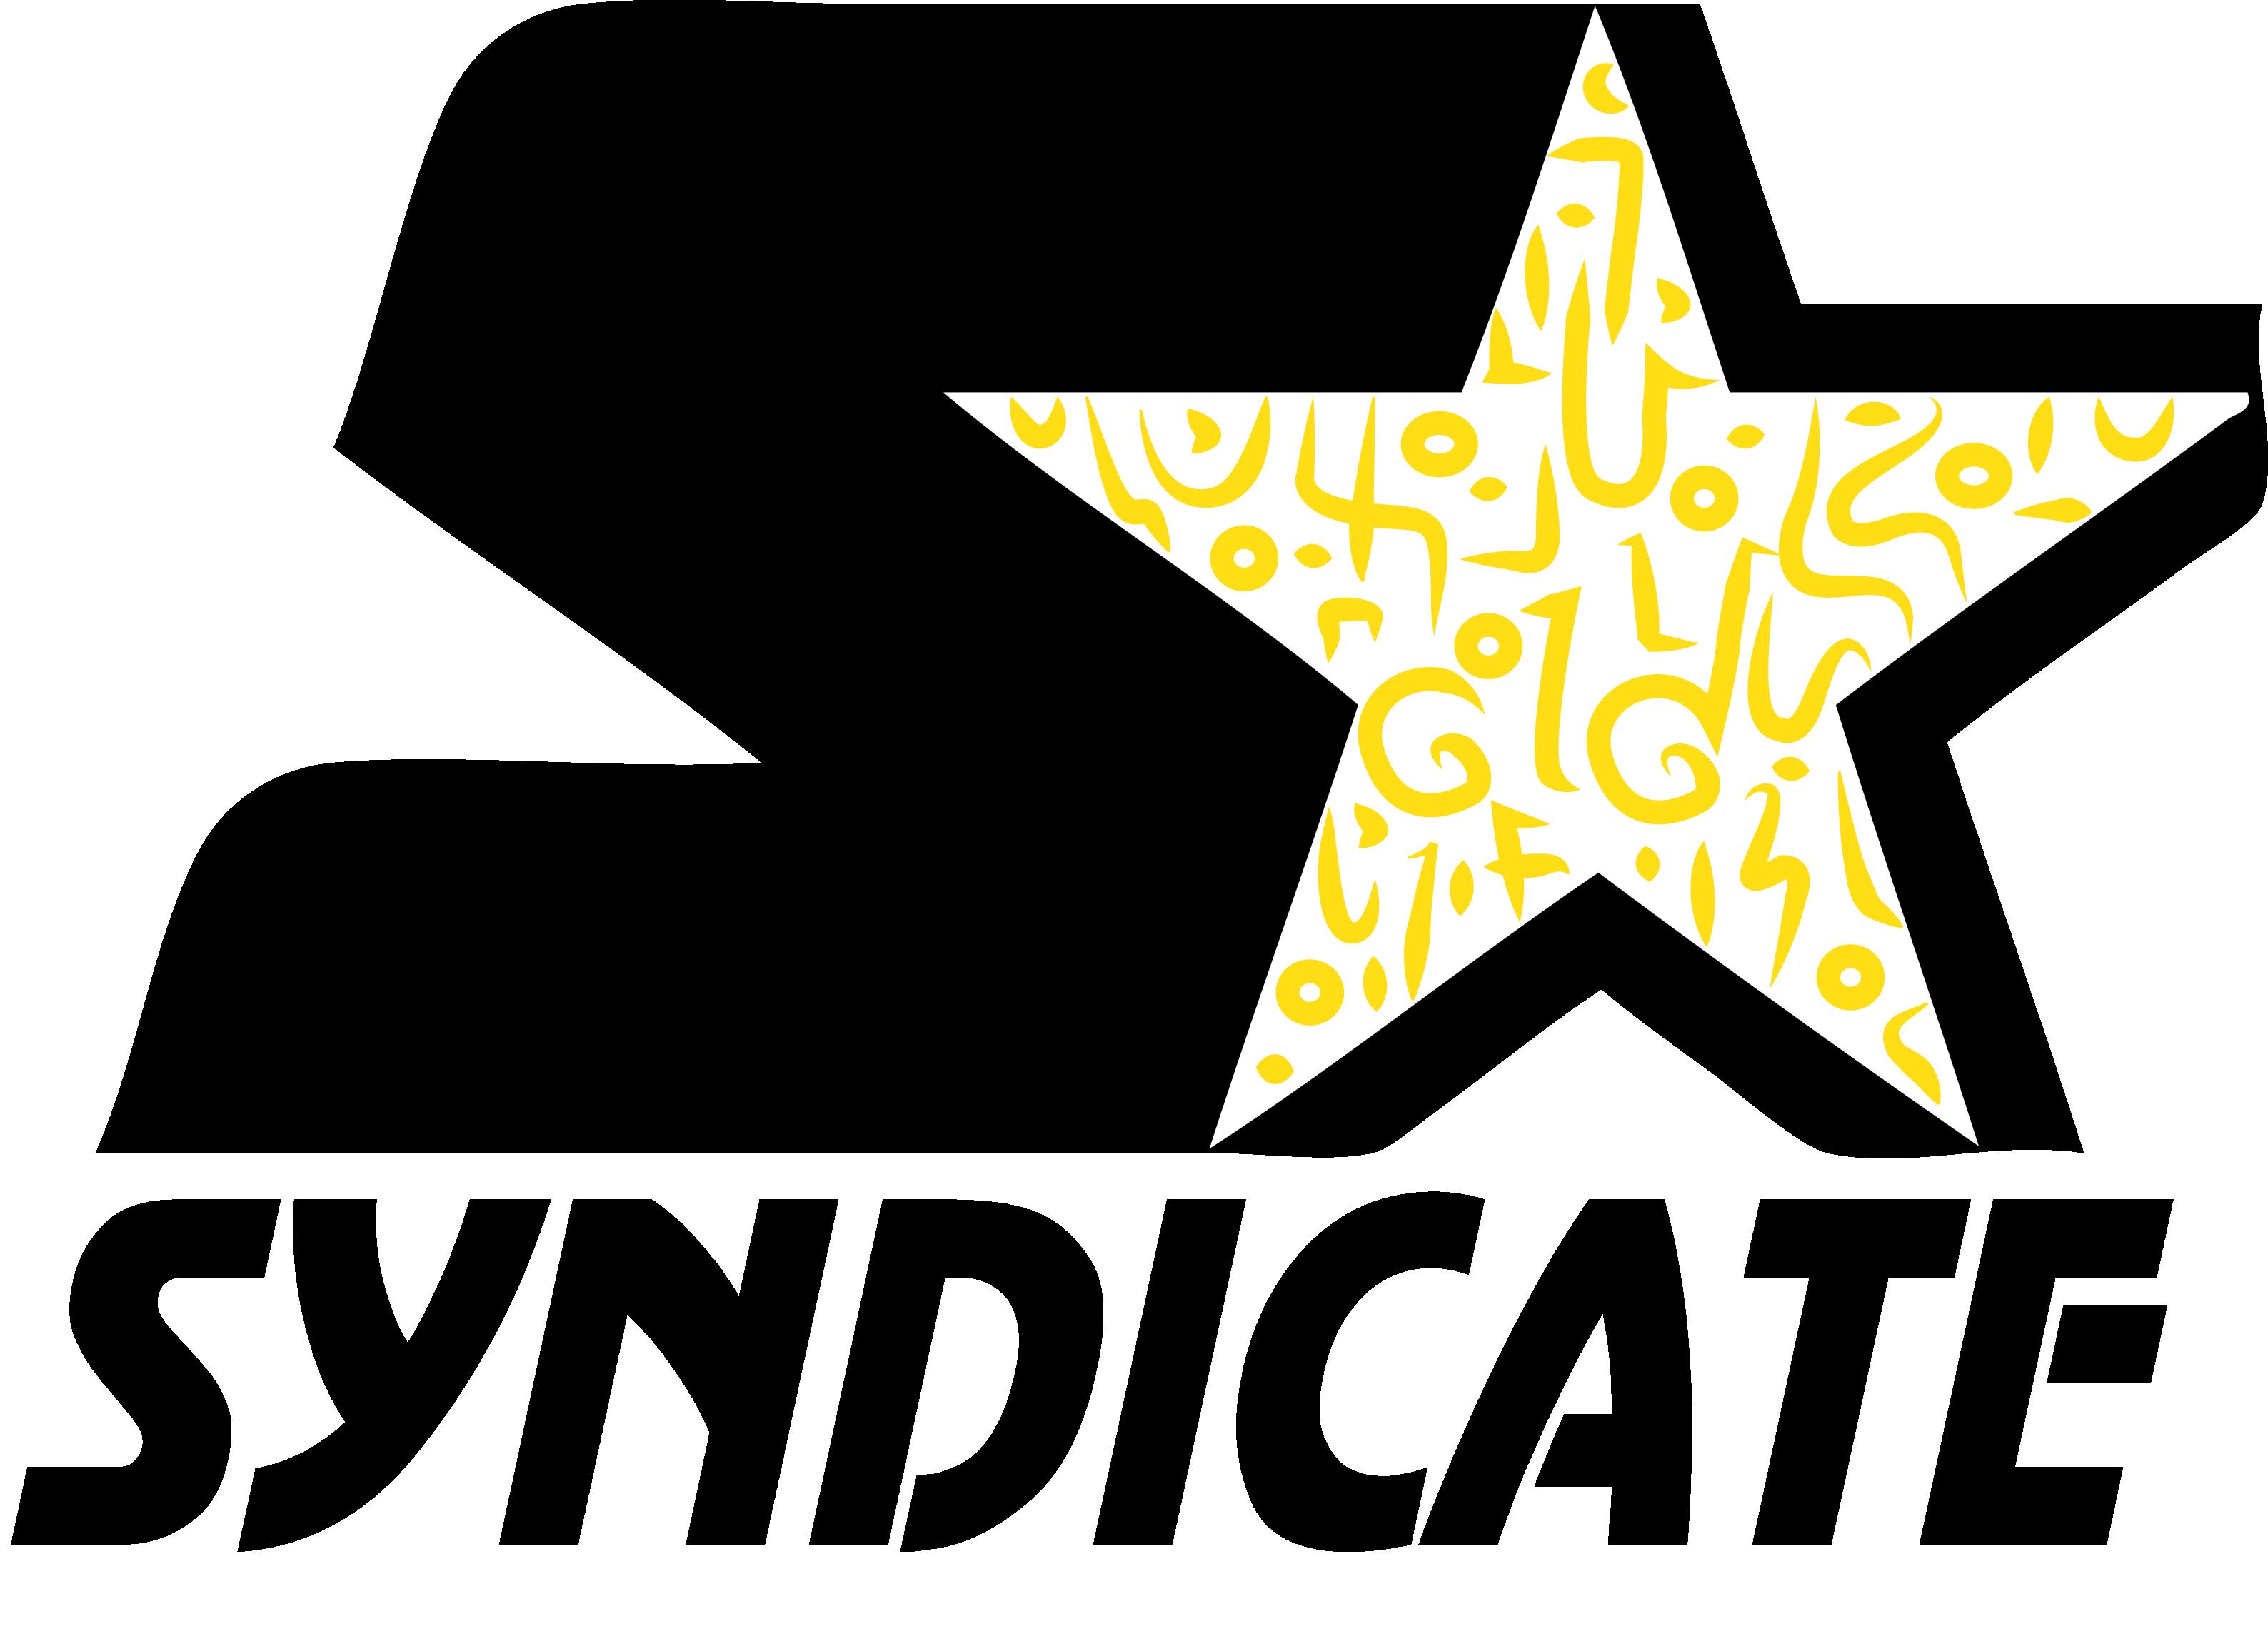 SYNDICATE BOARDSHOP logo design - 48HoursLogo.com